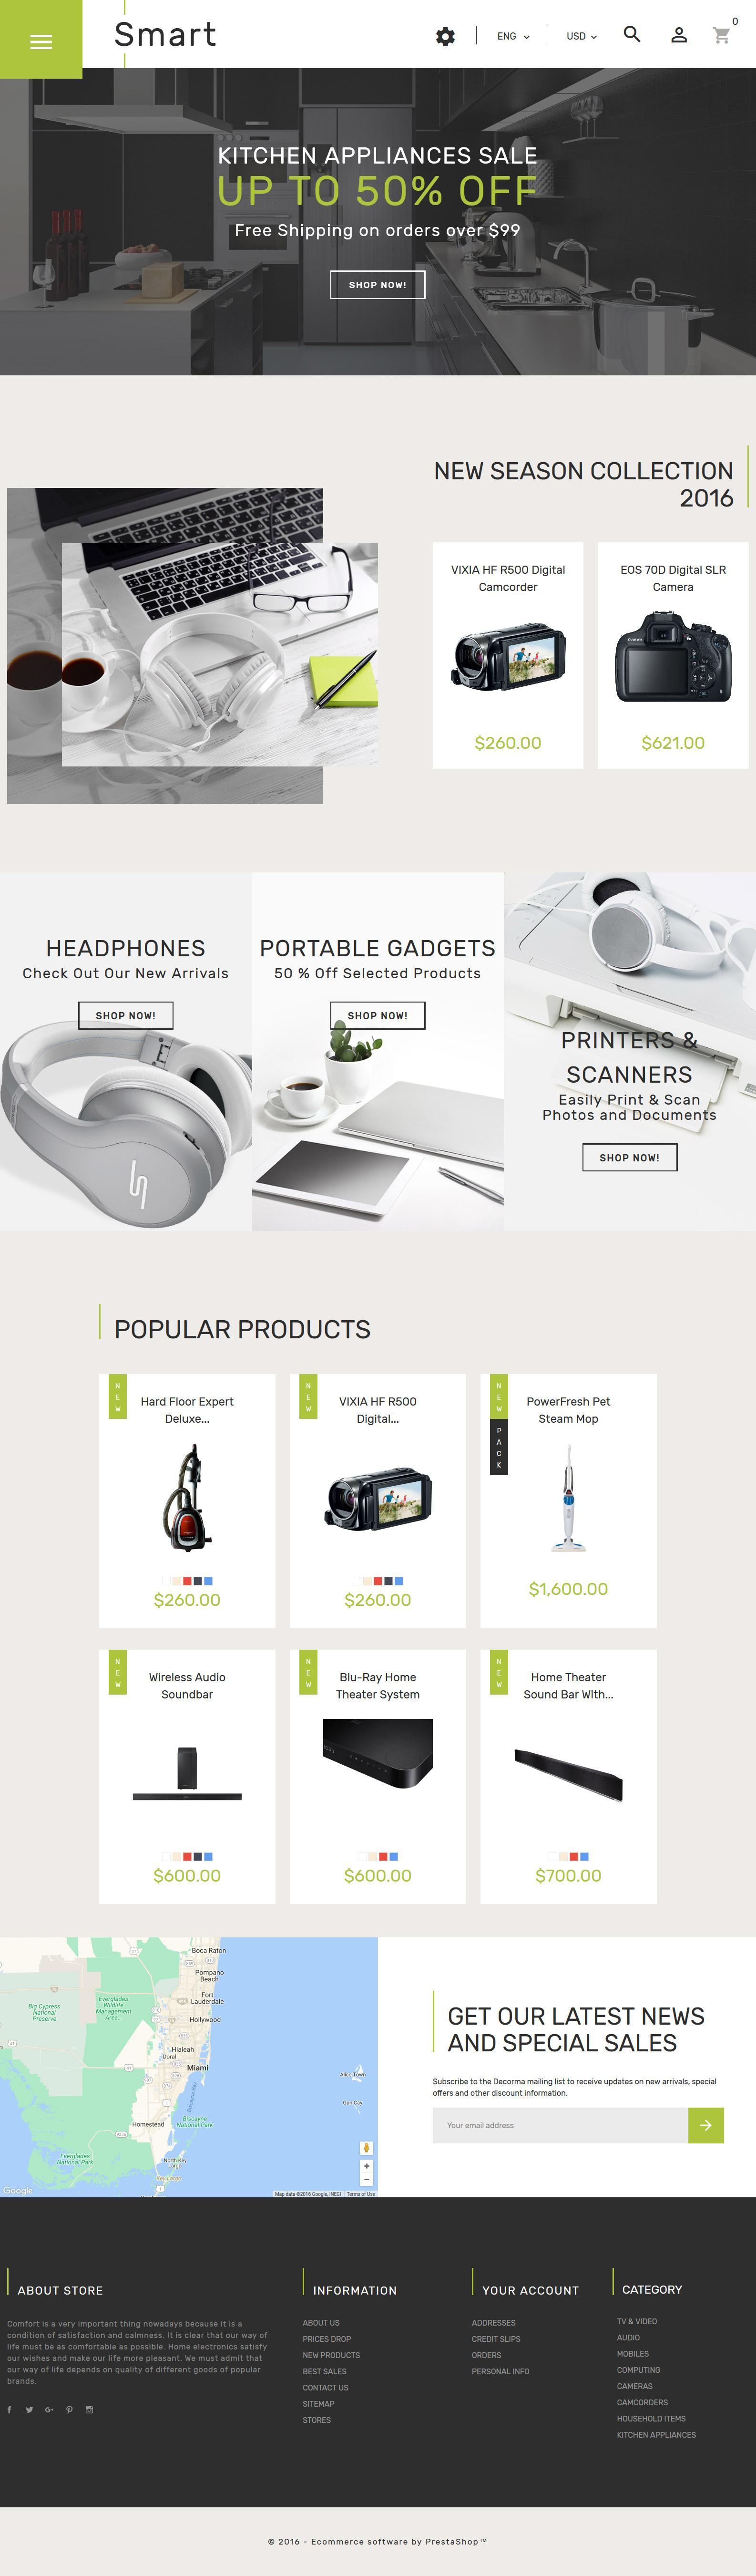 """Smart - Gadgets & Electronics"" - адаптивний PrestaShop шаблон №61360 - скріншот"